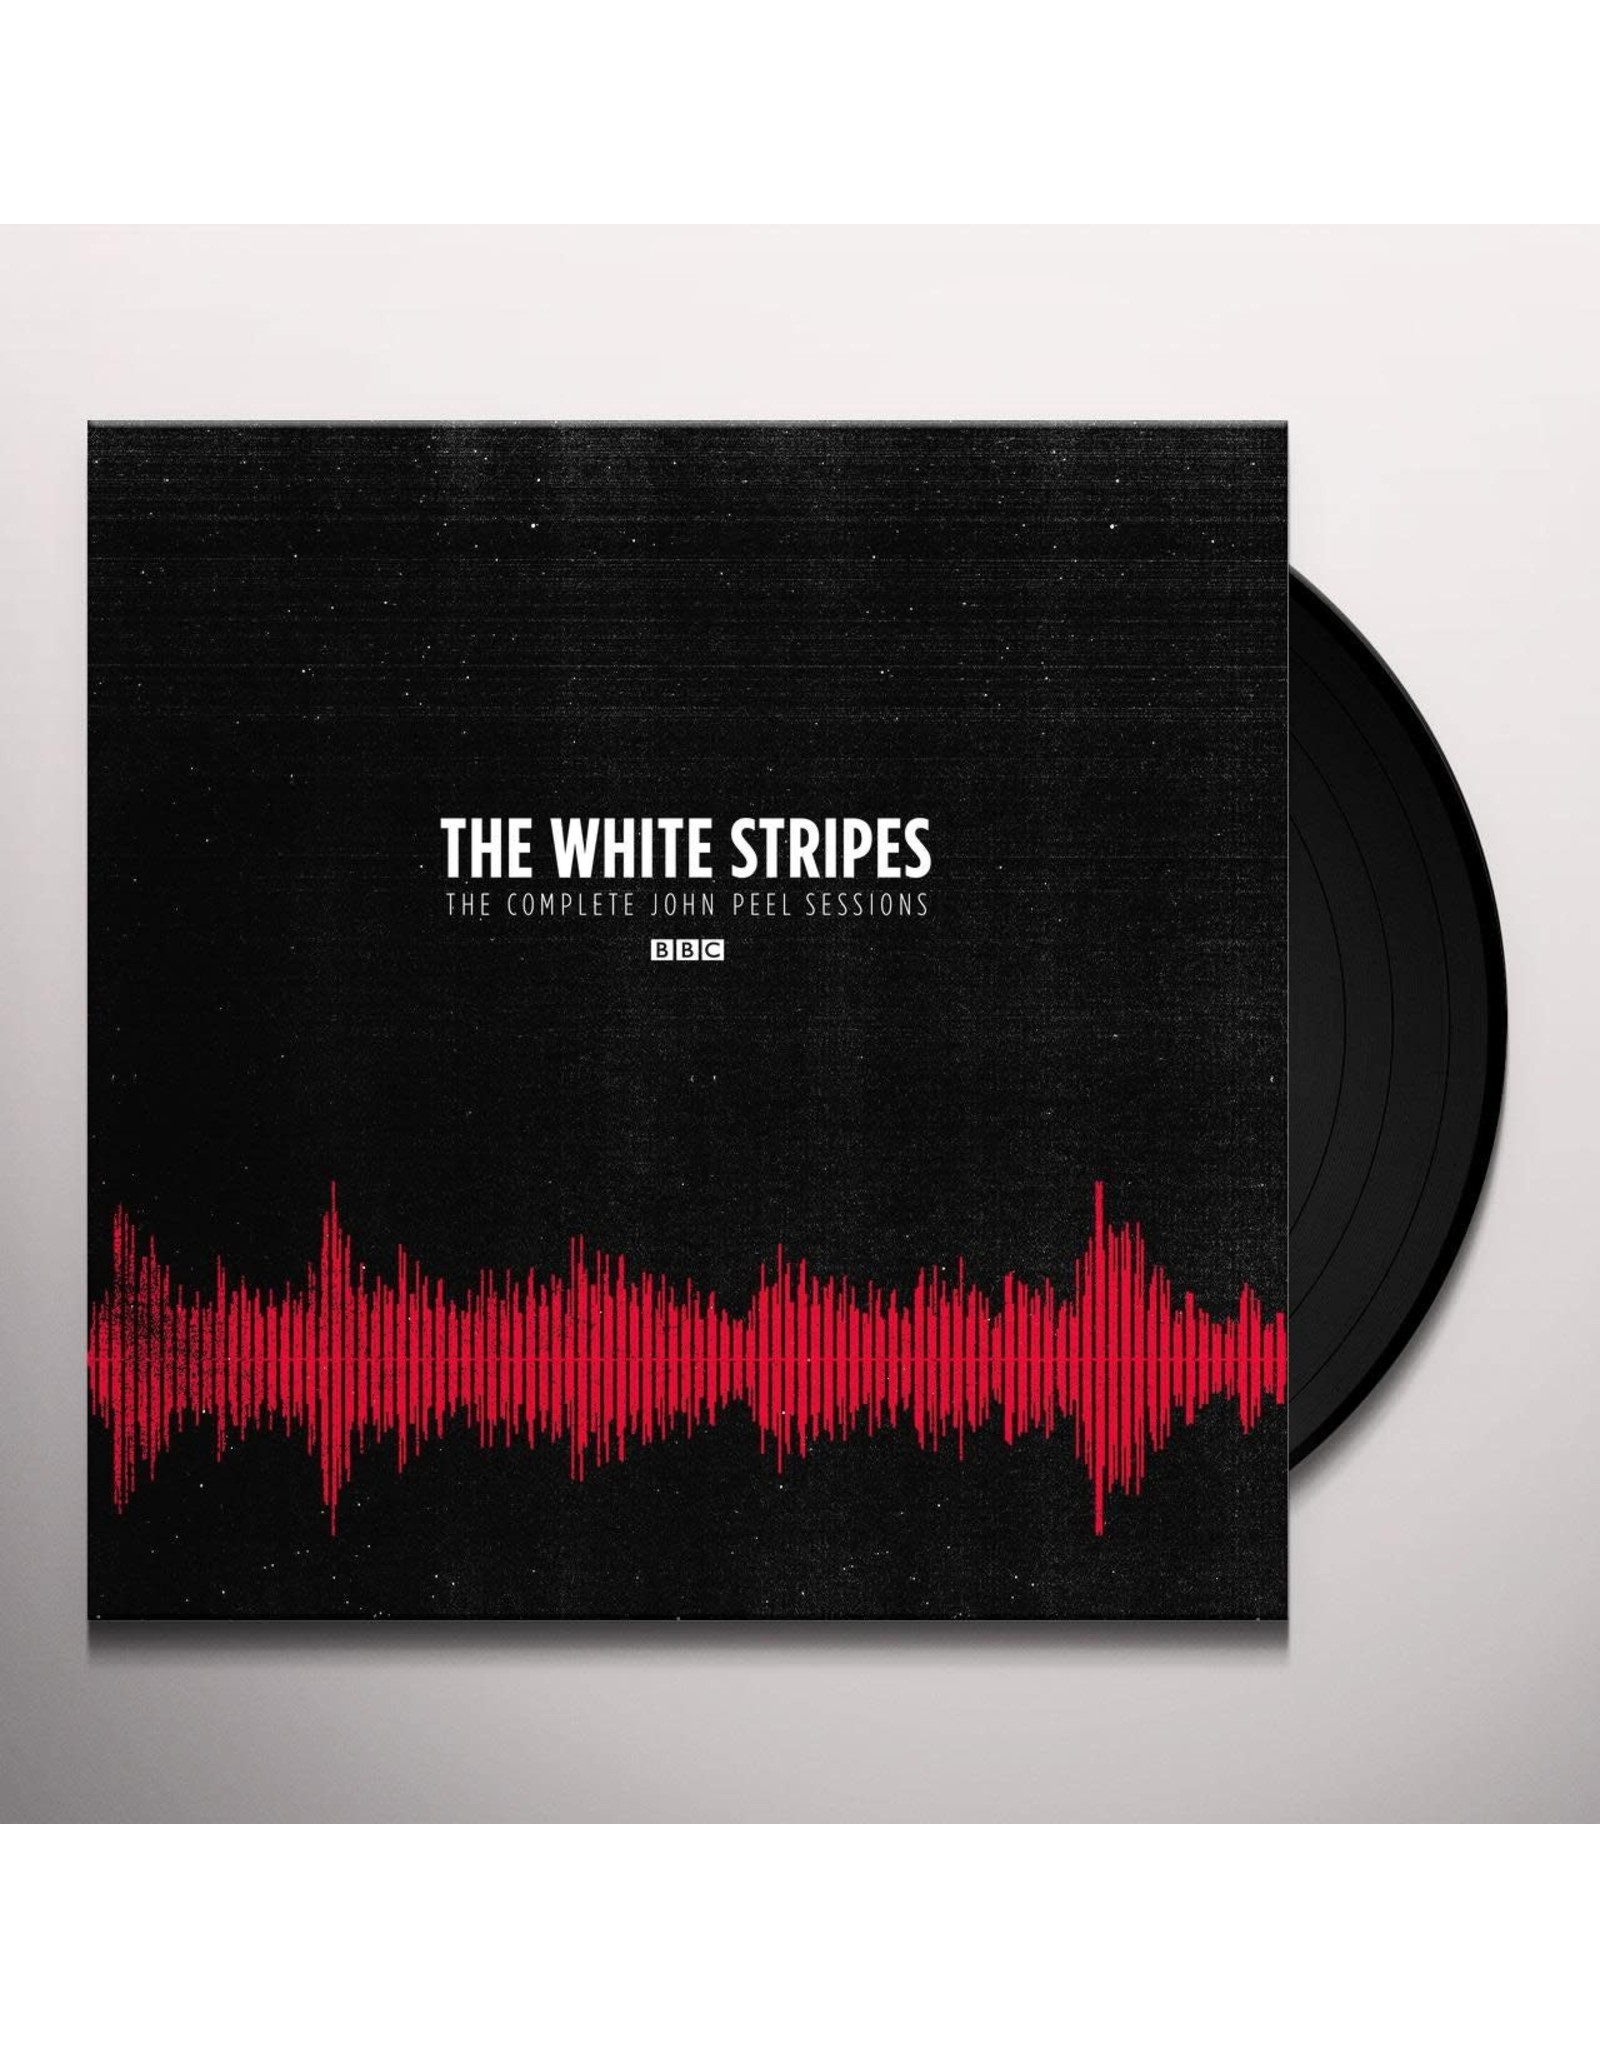 White Stripes - The Complete John Peel Sessions LP